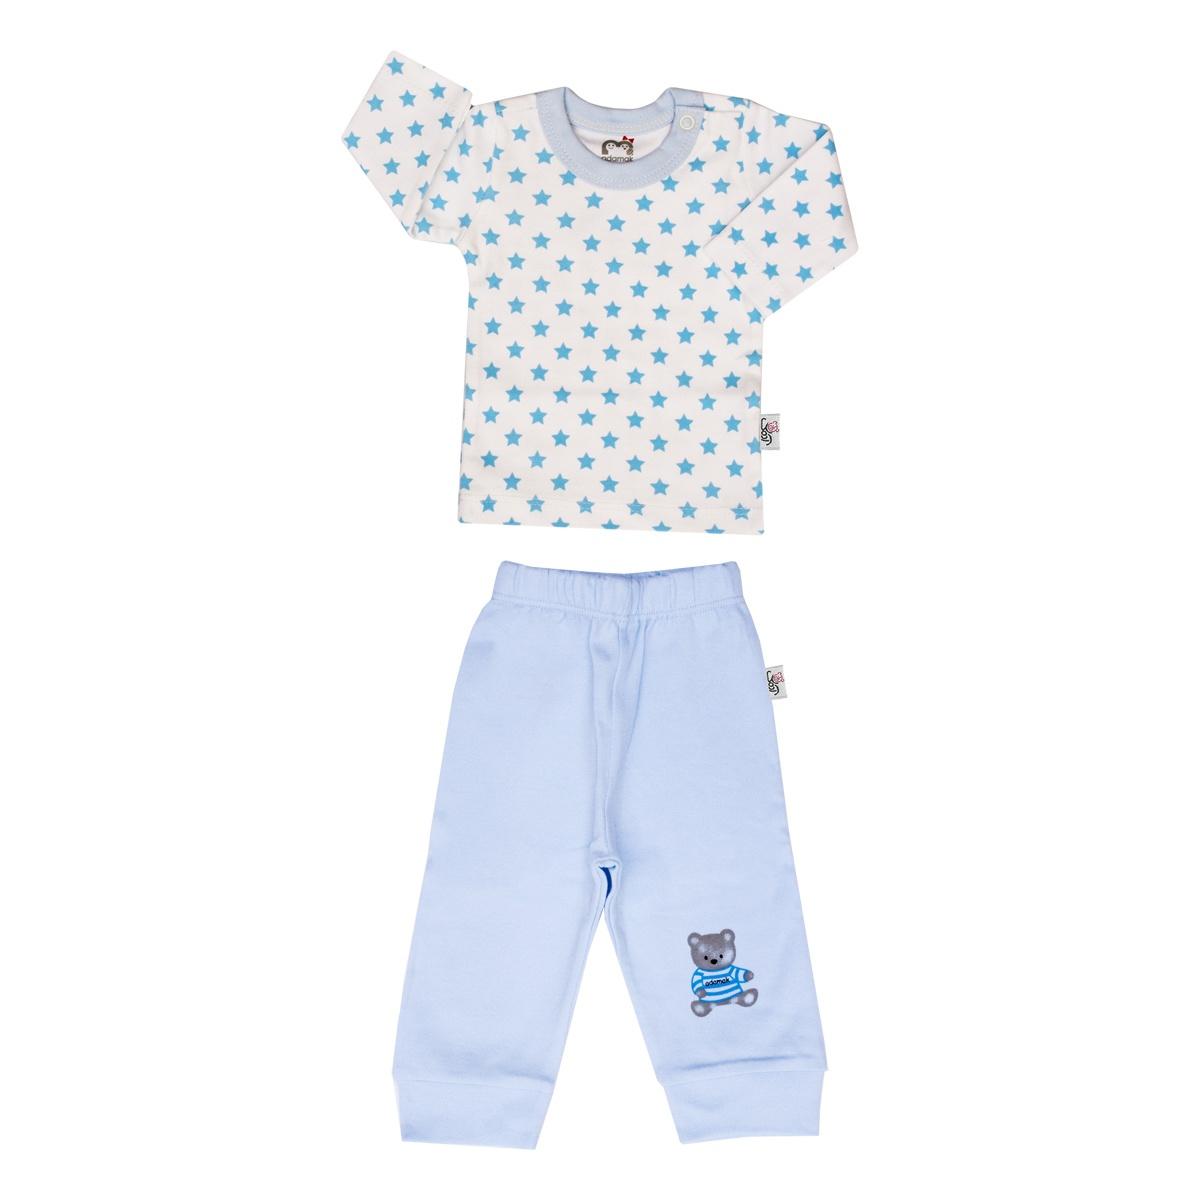 ست تی شرت و شلوار نوزادی پسرانه آدمک طرح ستاره آبی  کد 04